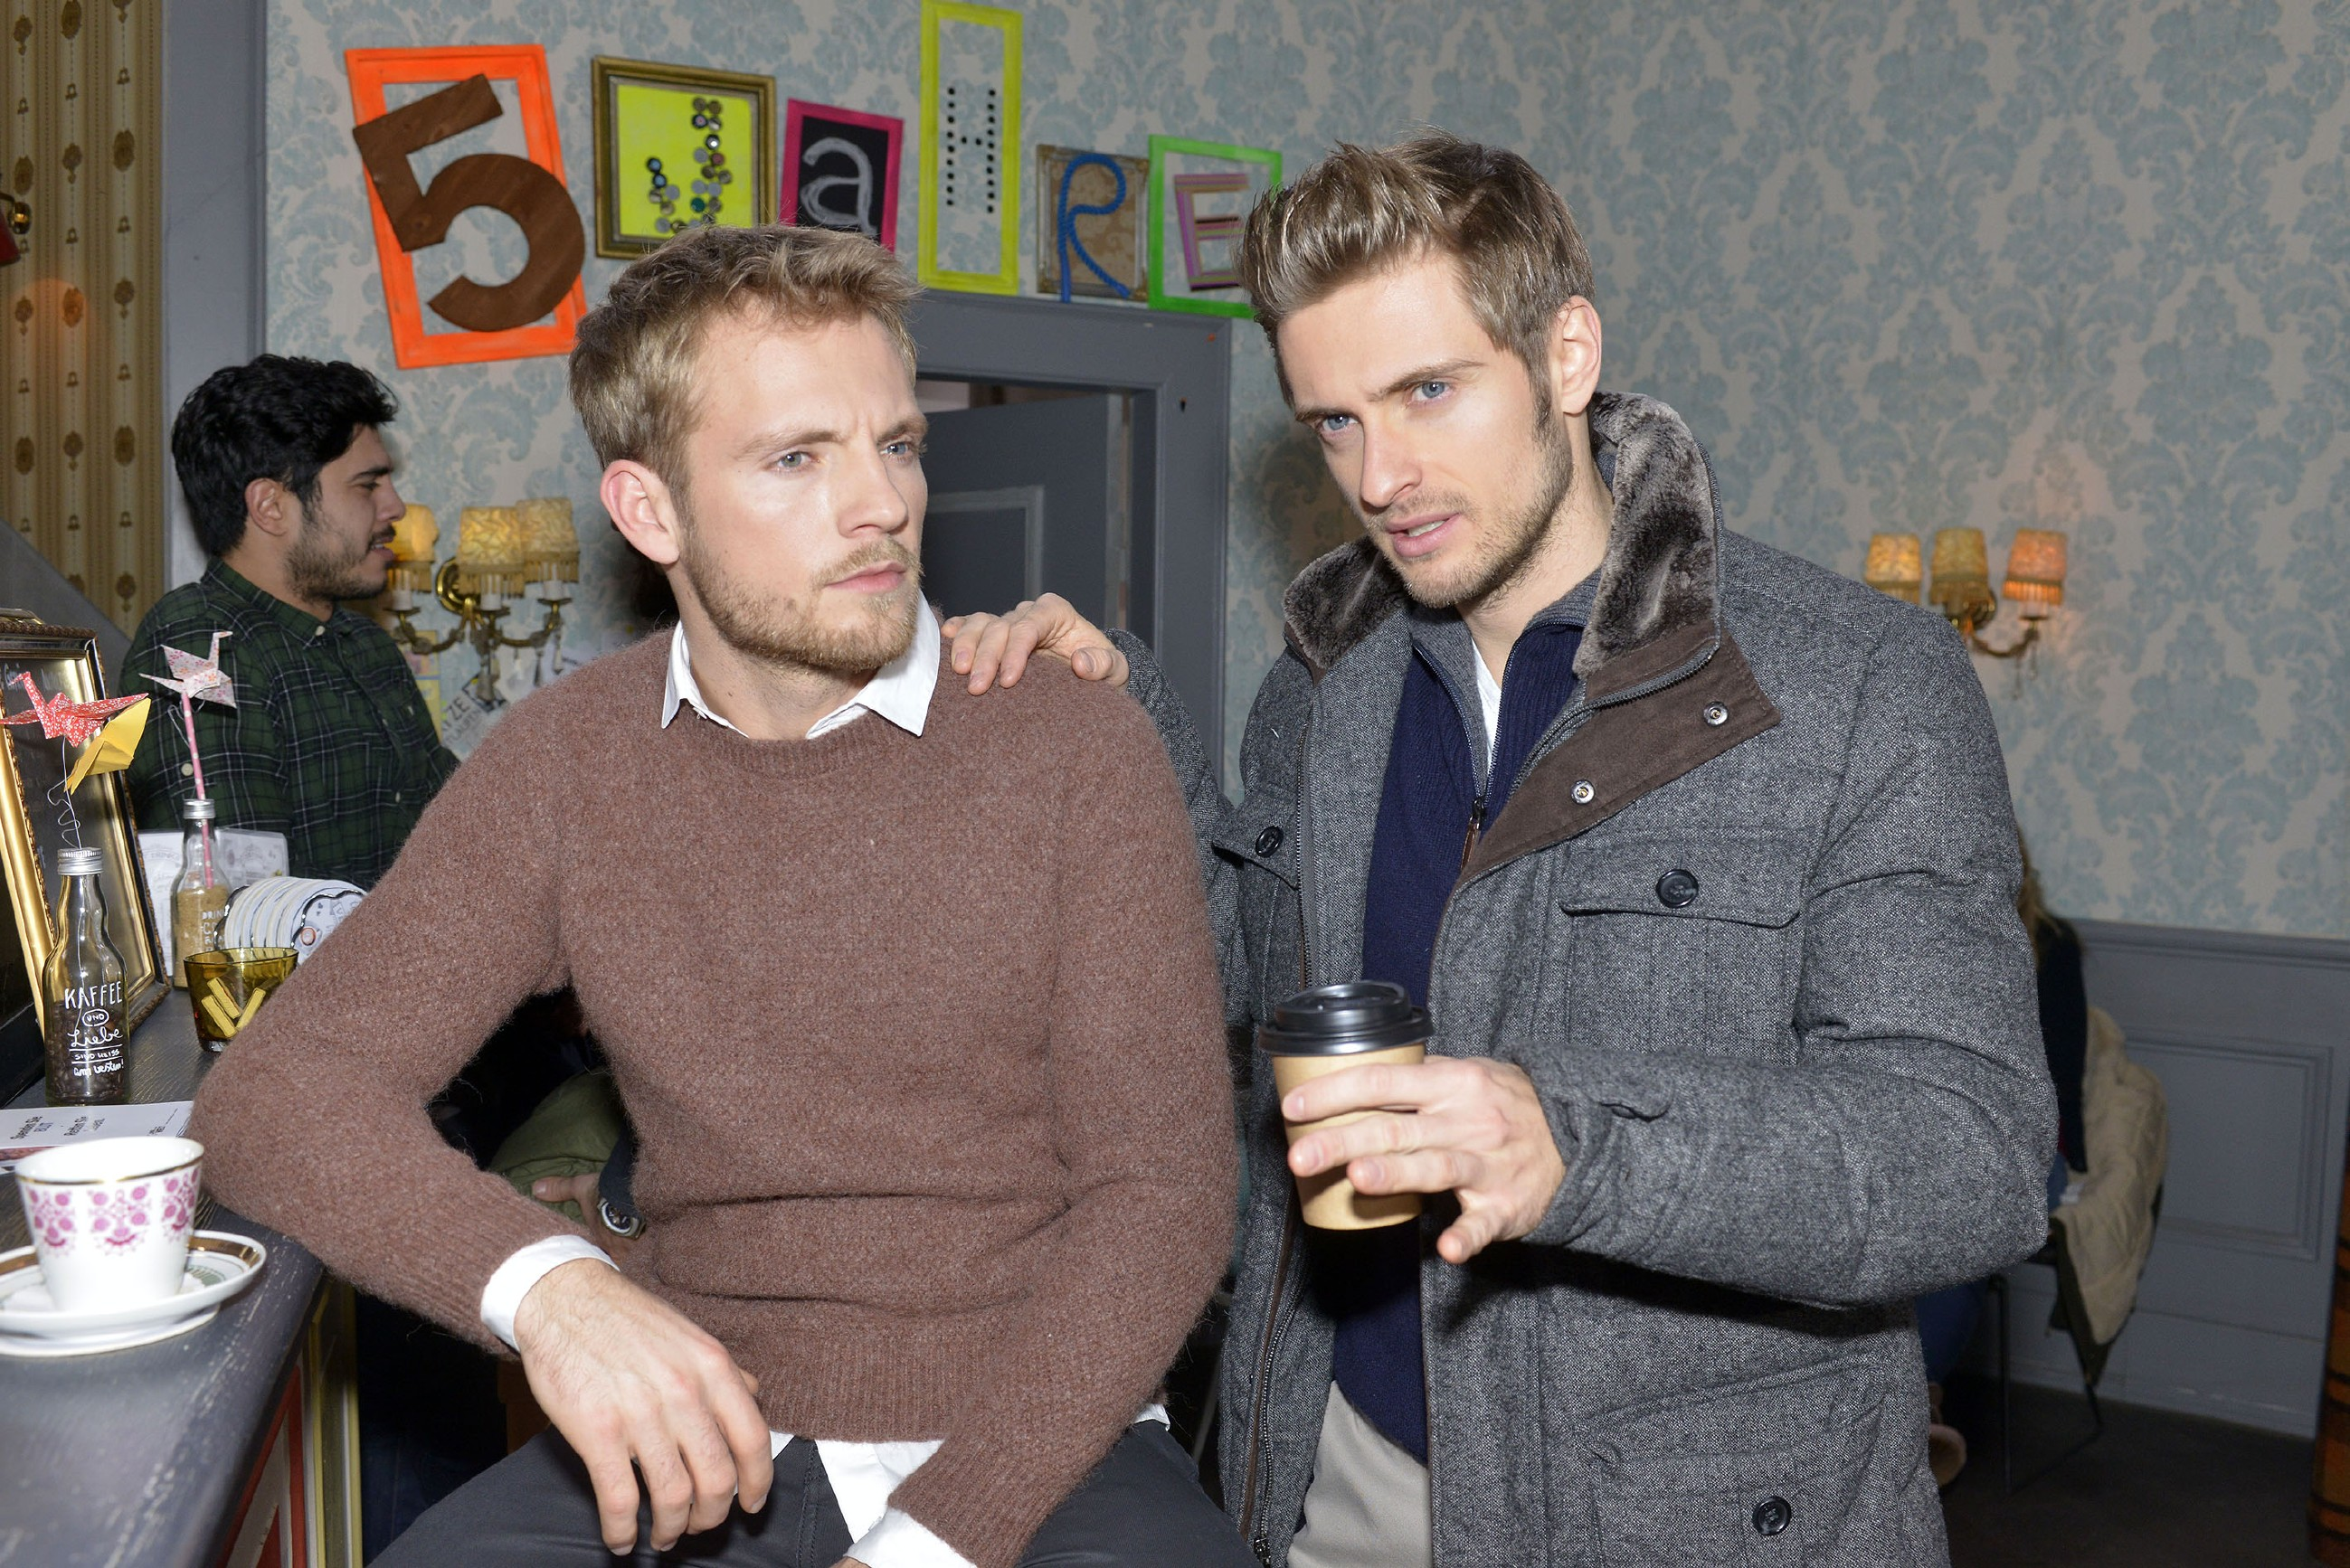 Philip (Jörn Schlönvoigt, r.) gibt Paul (Niklas Osterloh) Ratschläge für den Umgang mit Emily. (Quelle: RTL / Rolf Baumgartner)